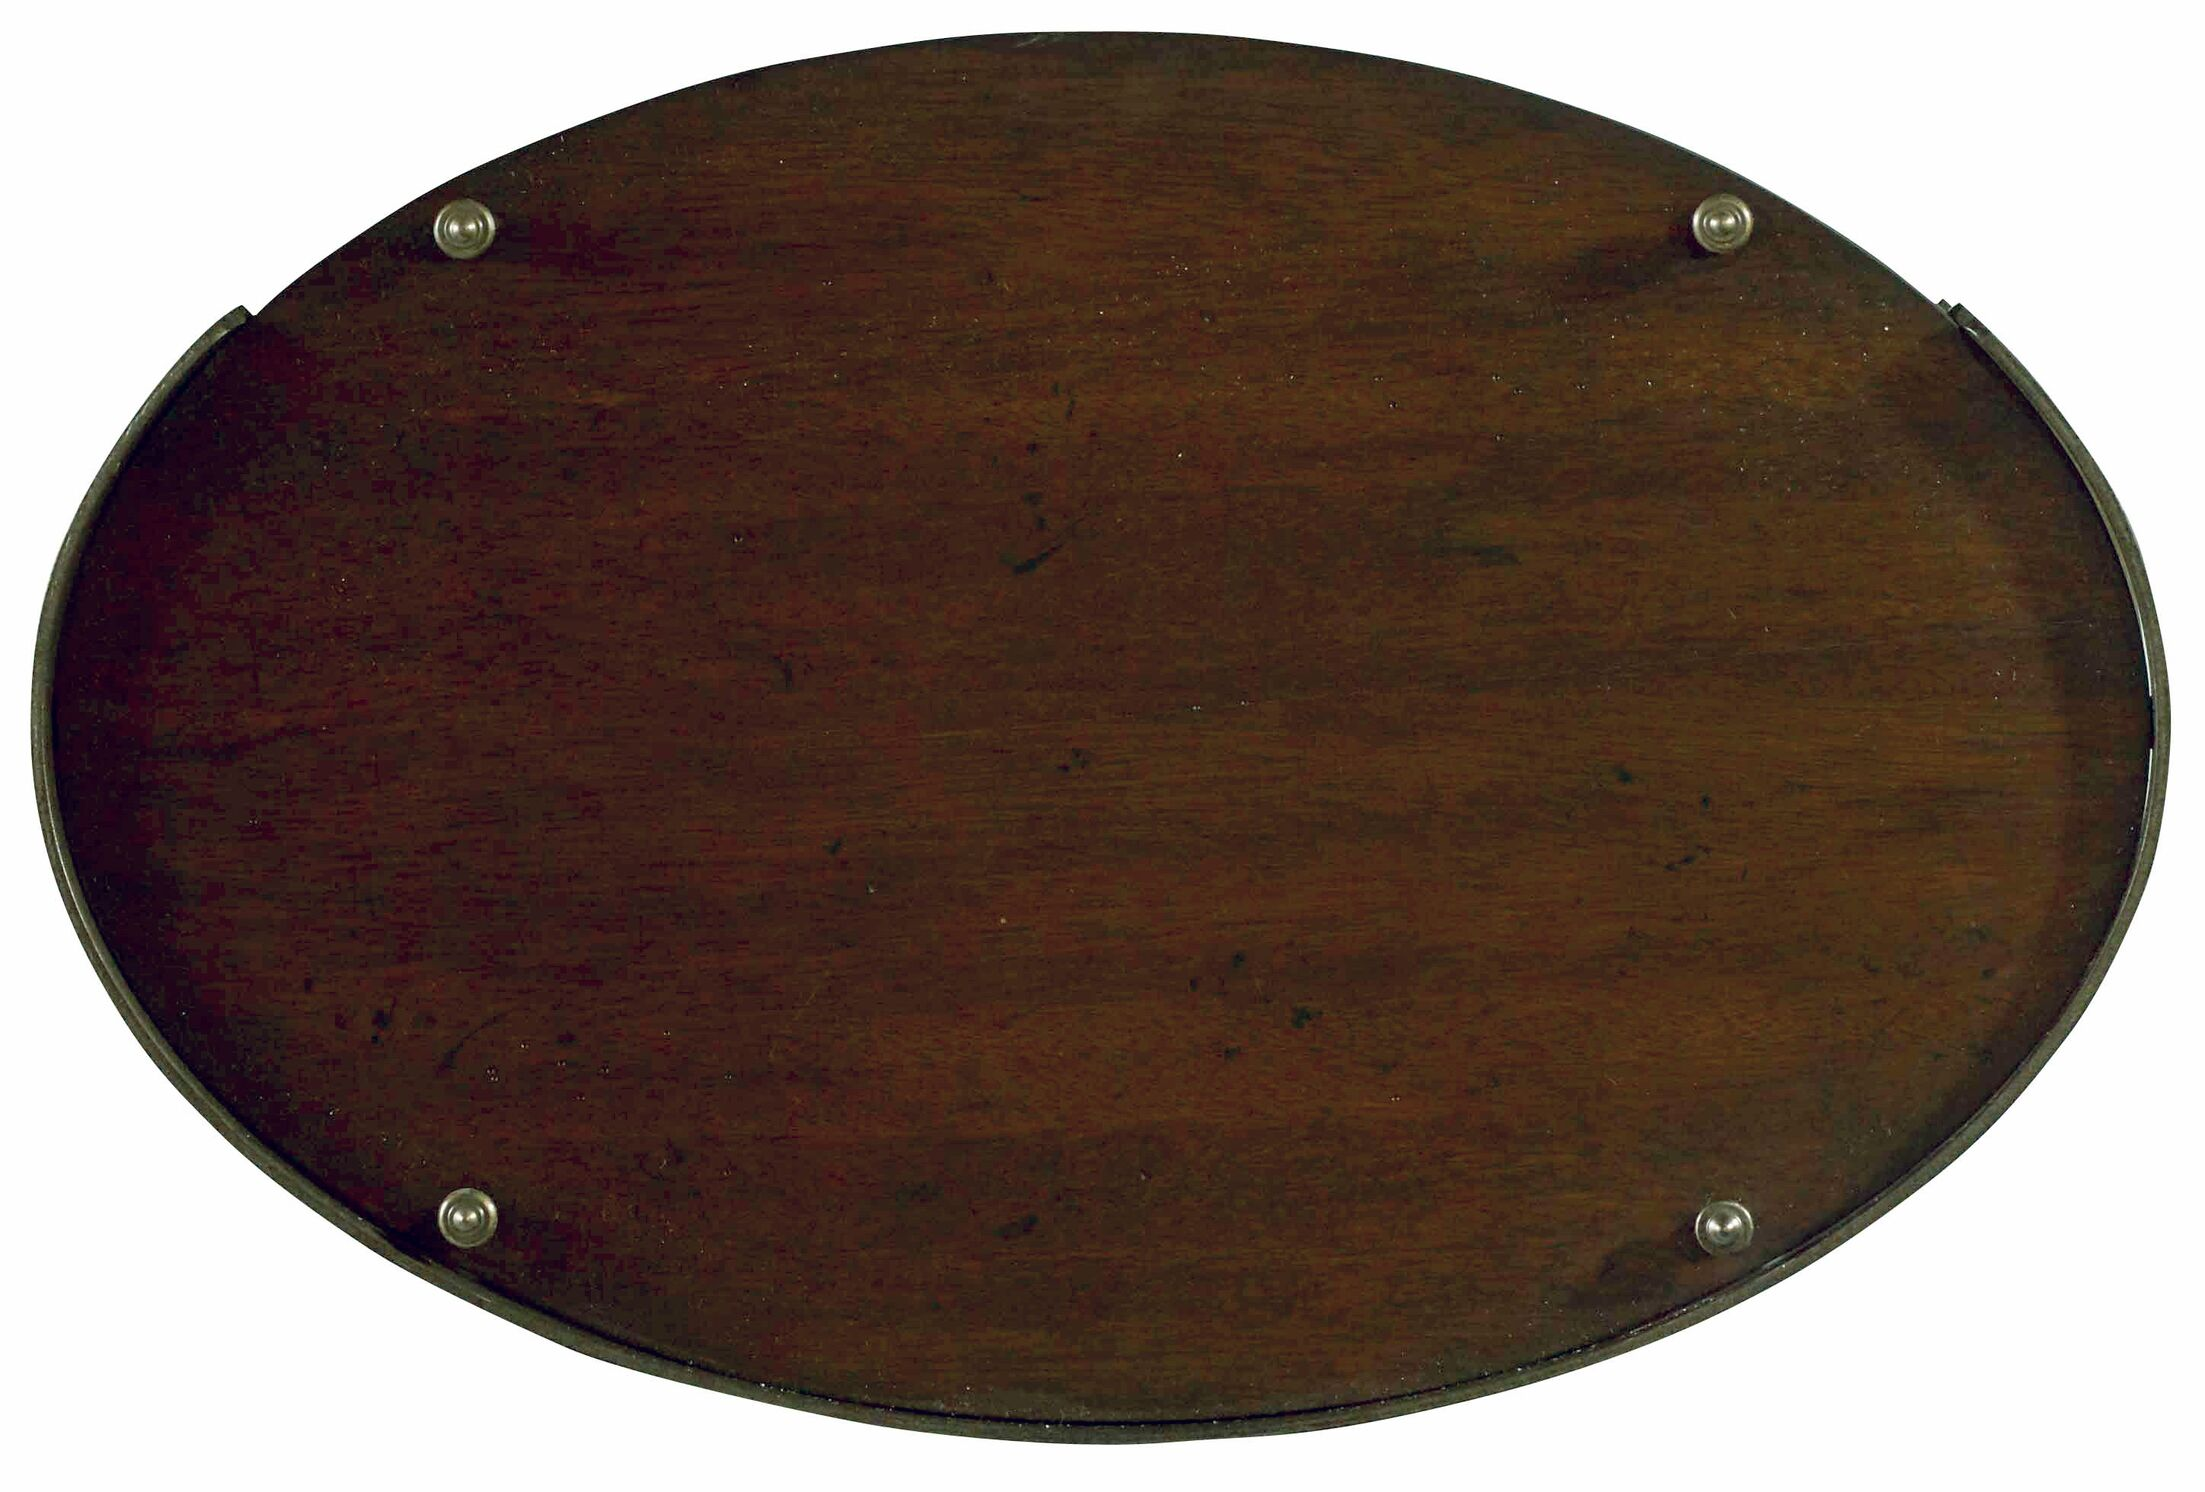 Leesburg Tray Table